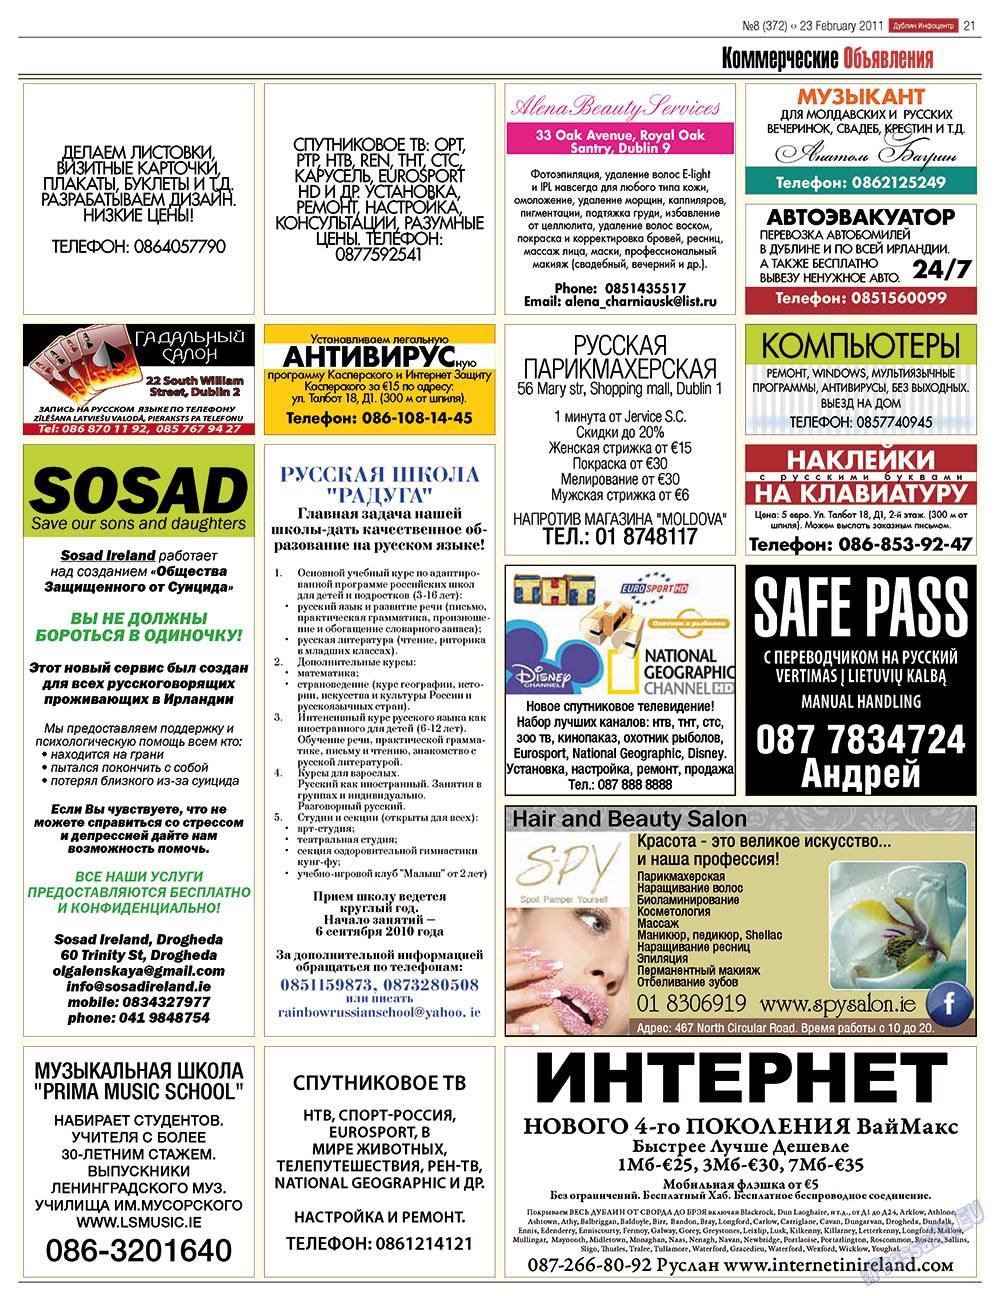 Дублин инфоцентр (газета). 2011 год, номер 8, стр. 21